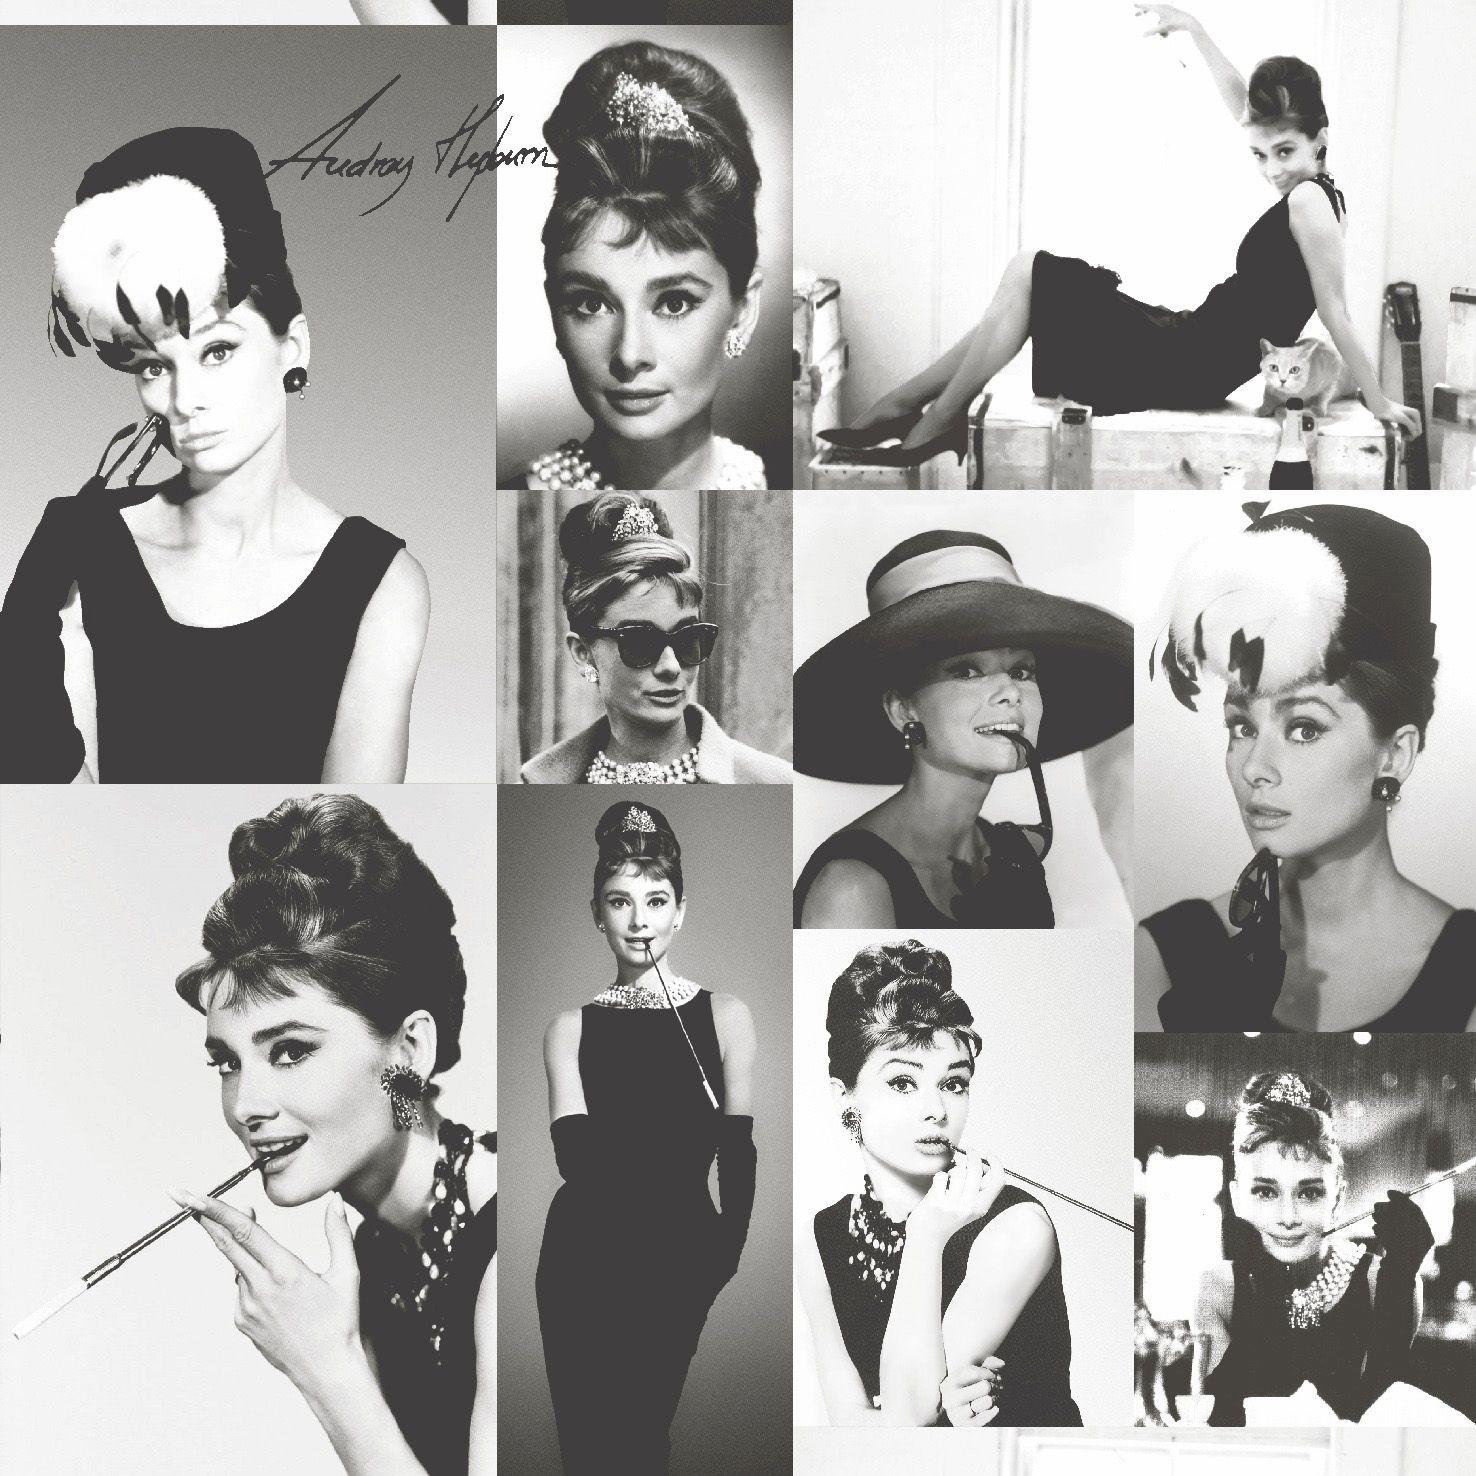 Statement Black White Audrey Hepburn Photographic Wallpaper